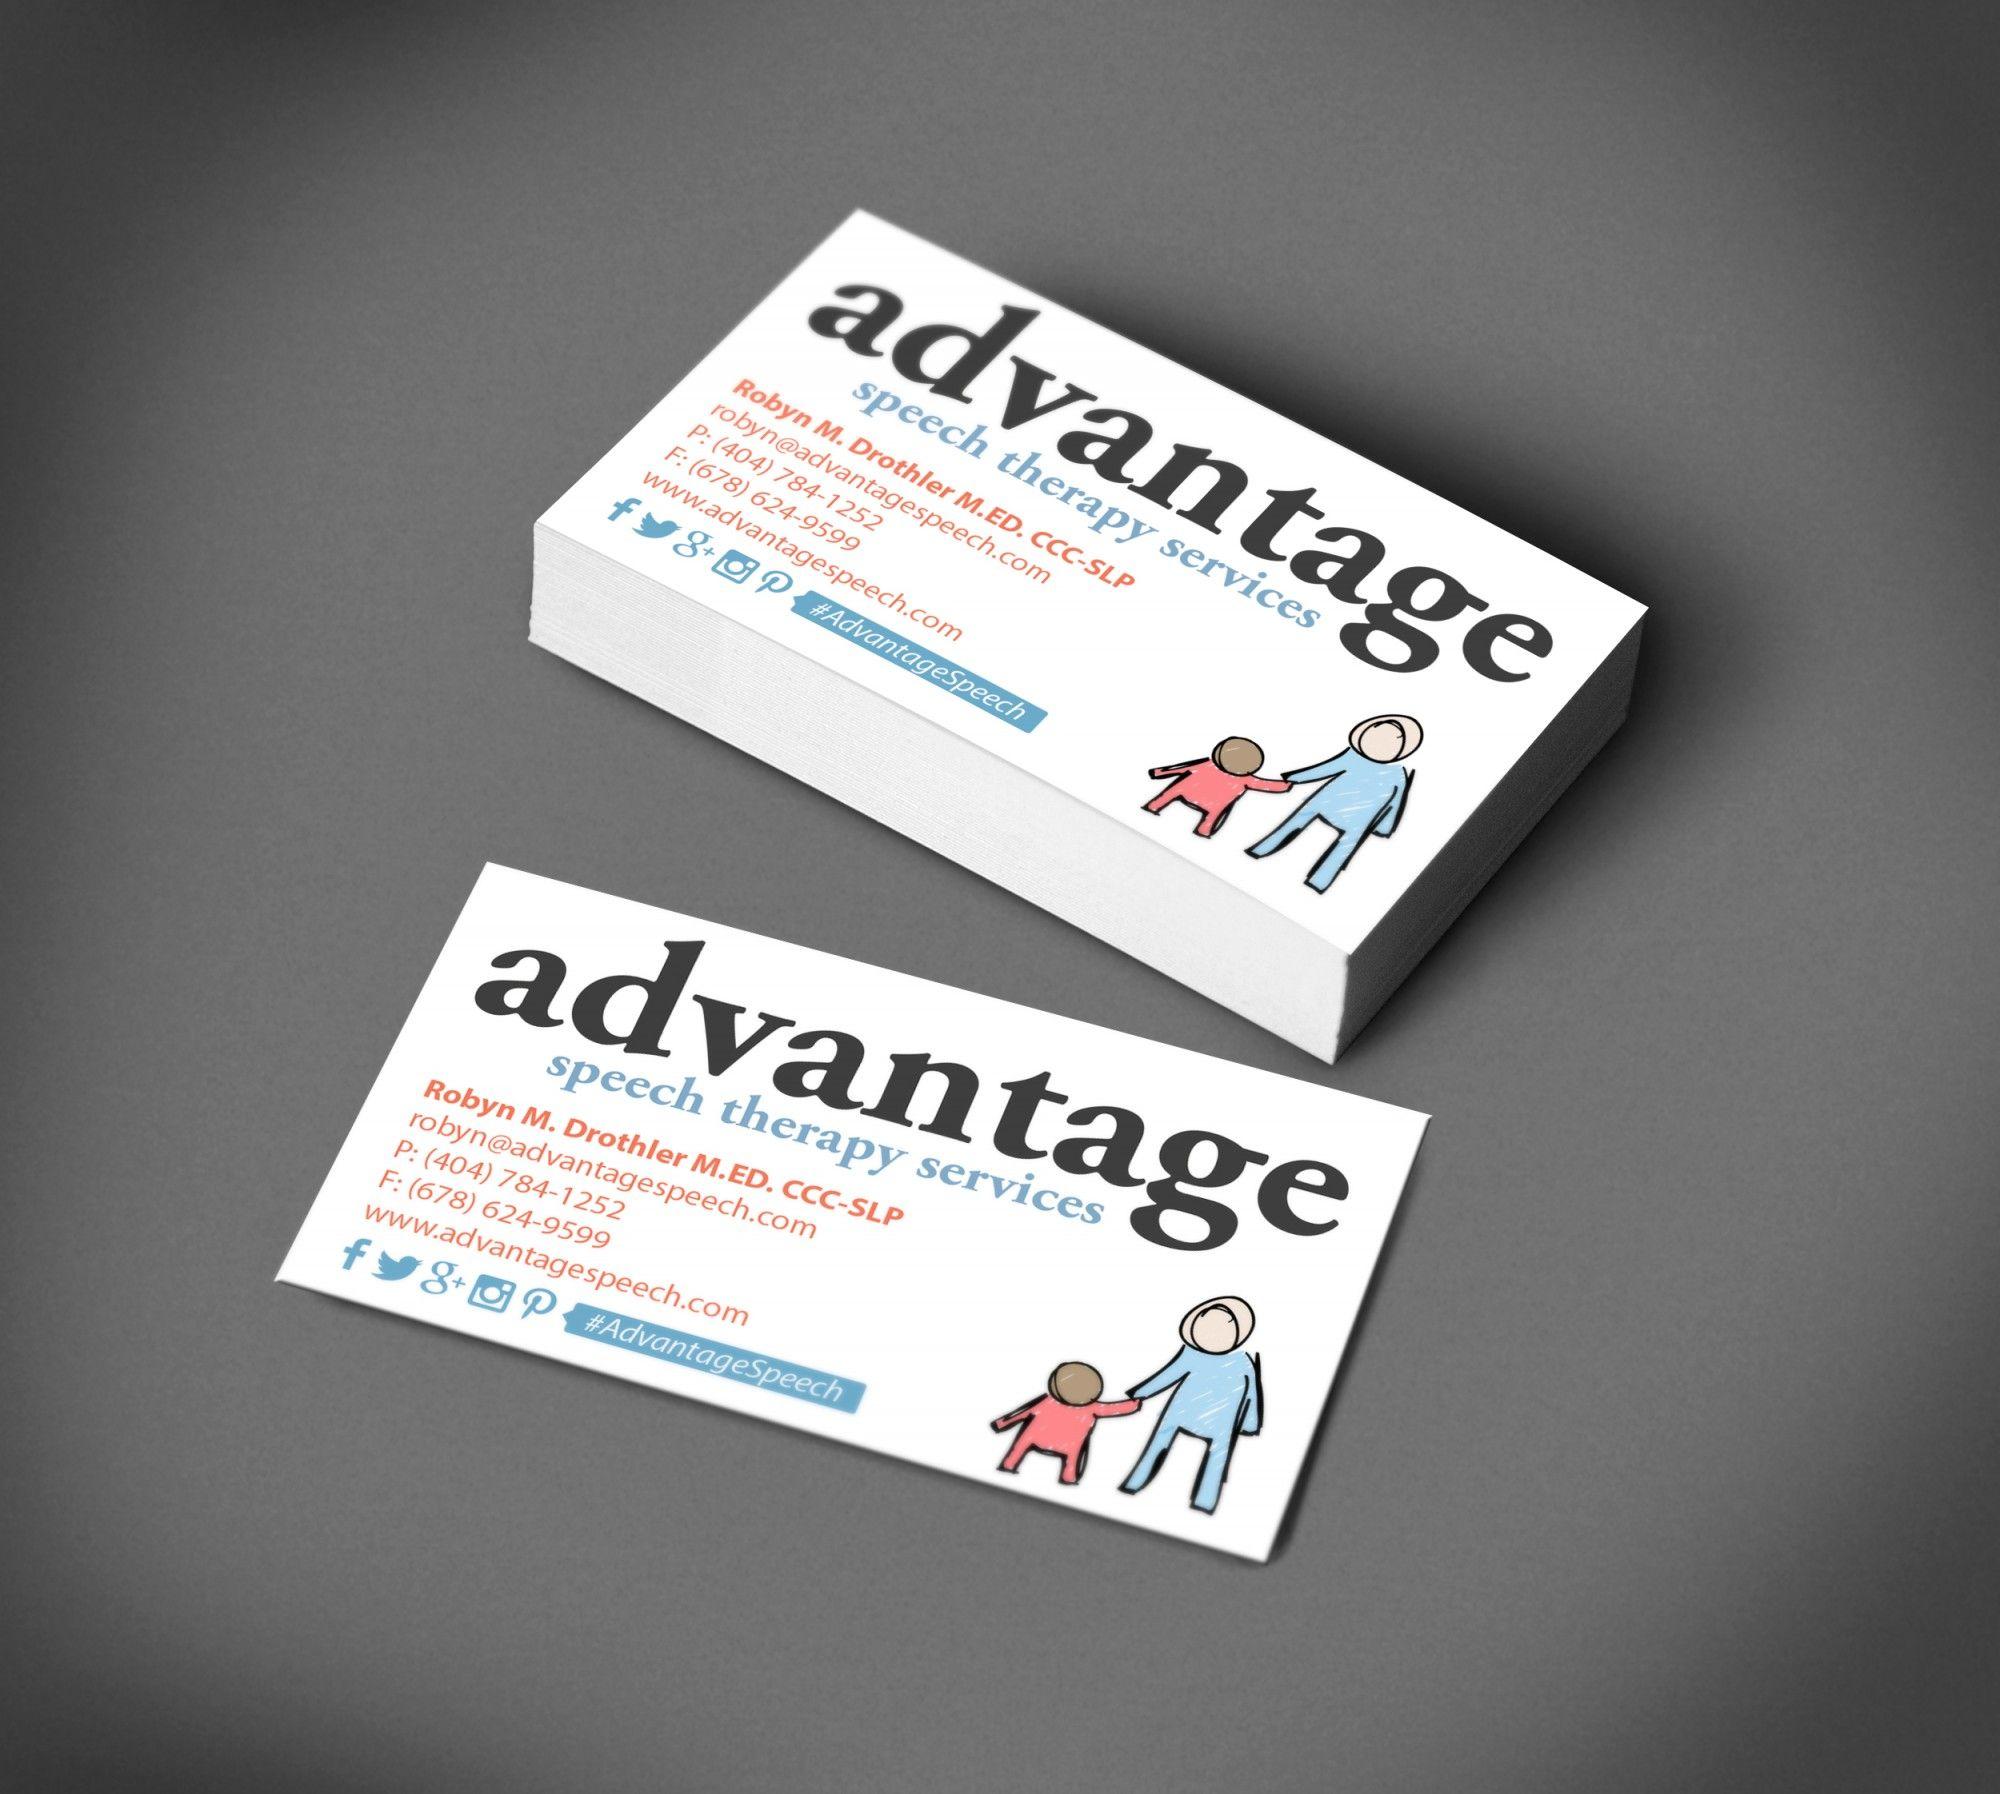 advantage speech therapy services market house